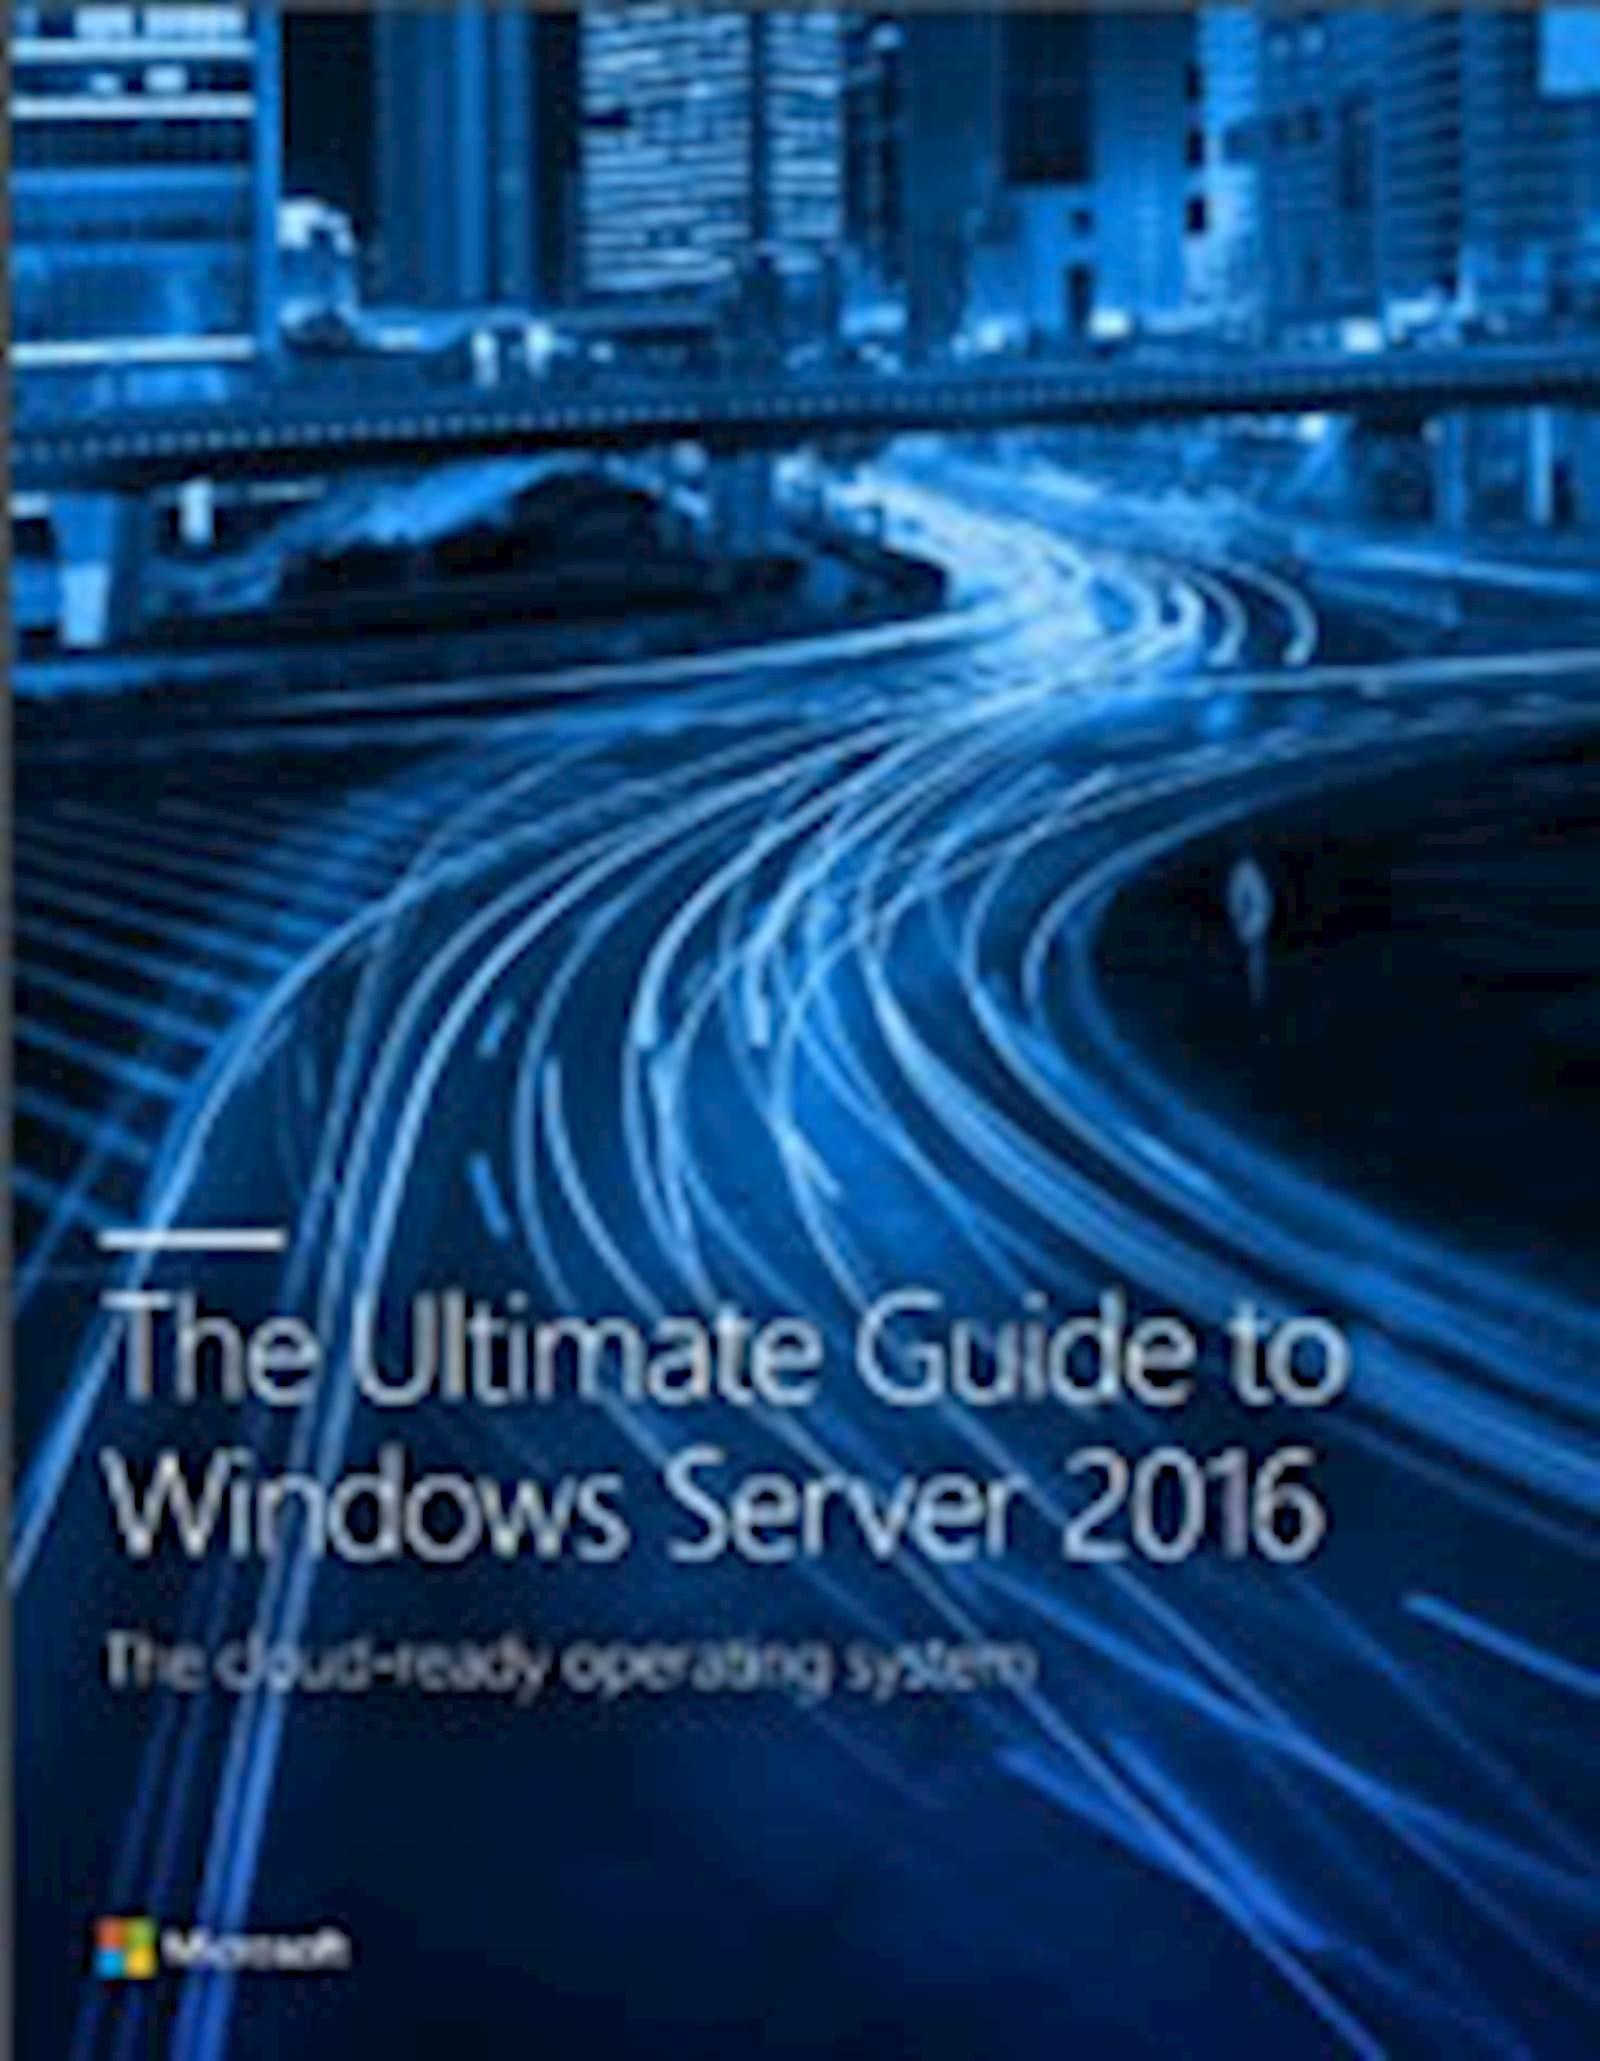 Download the Ultimate Guide to Windows Server 2016 E-book